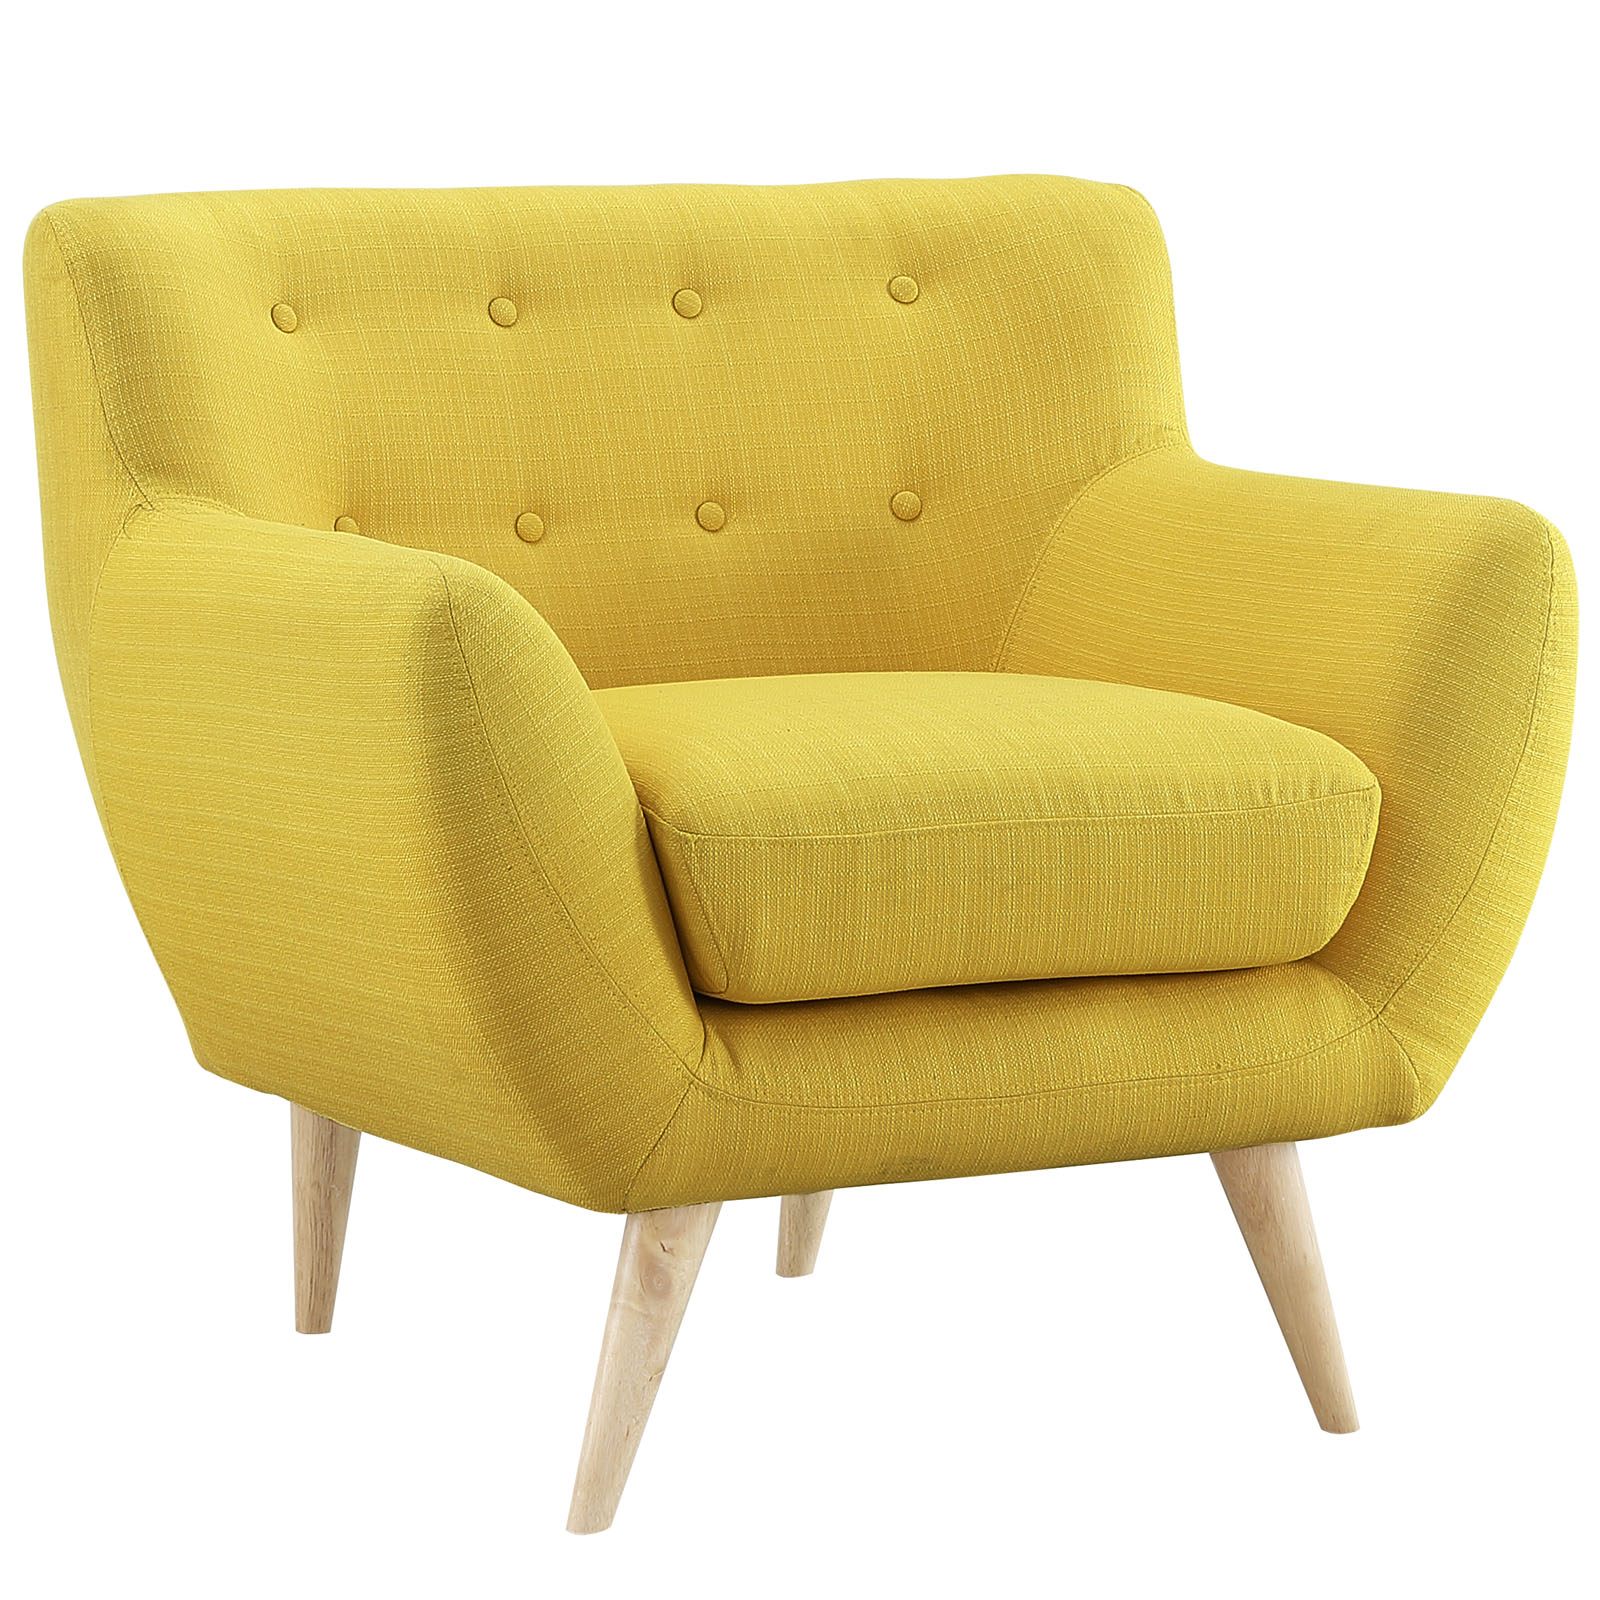 Dane Lounge Chair Rentals